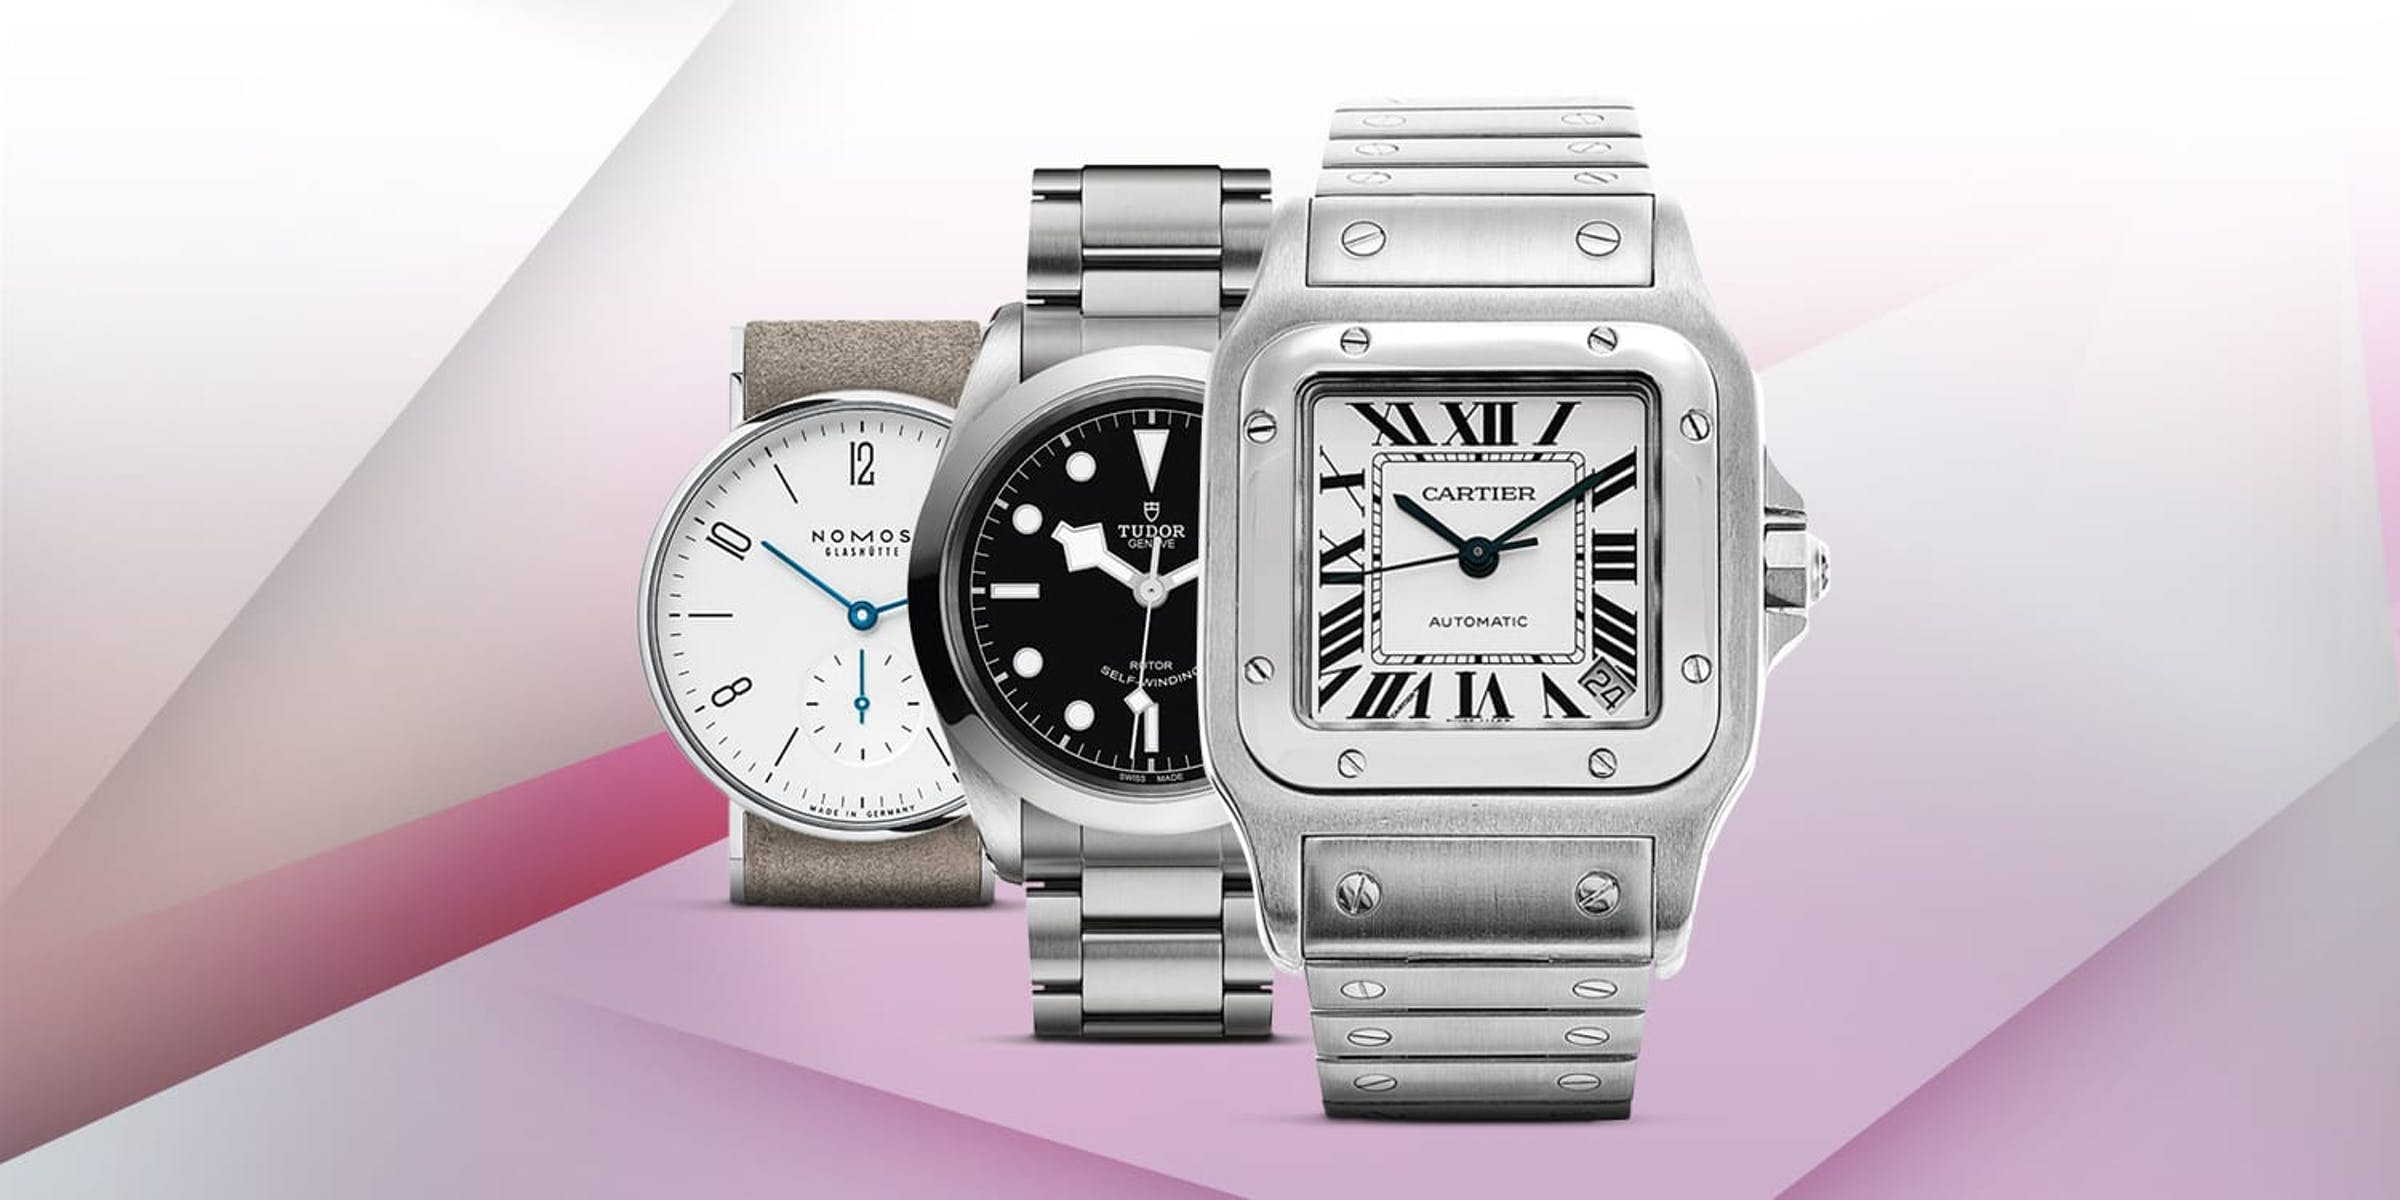 Top 5 Women's Watches Under $3,000